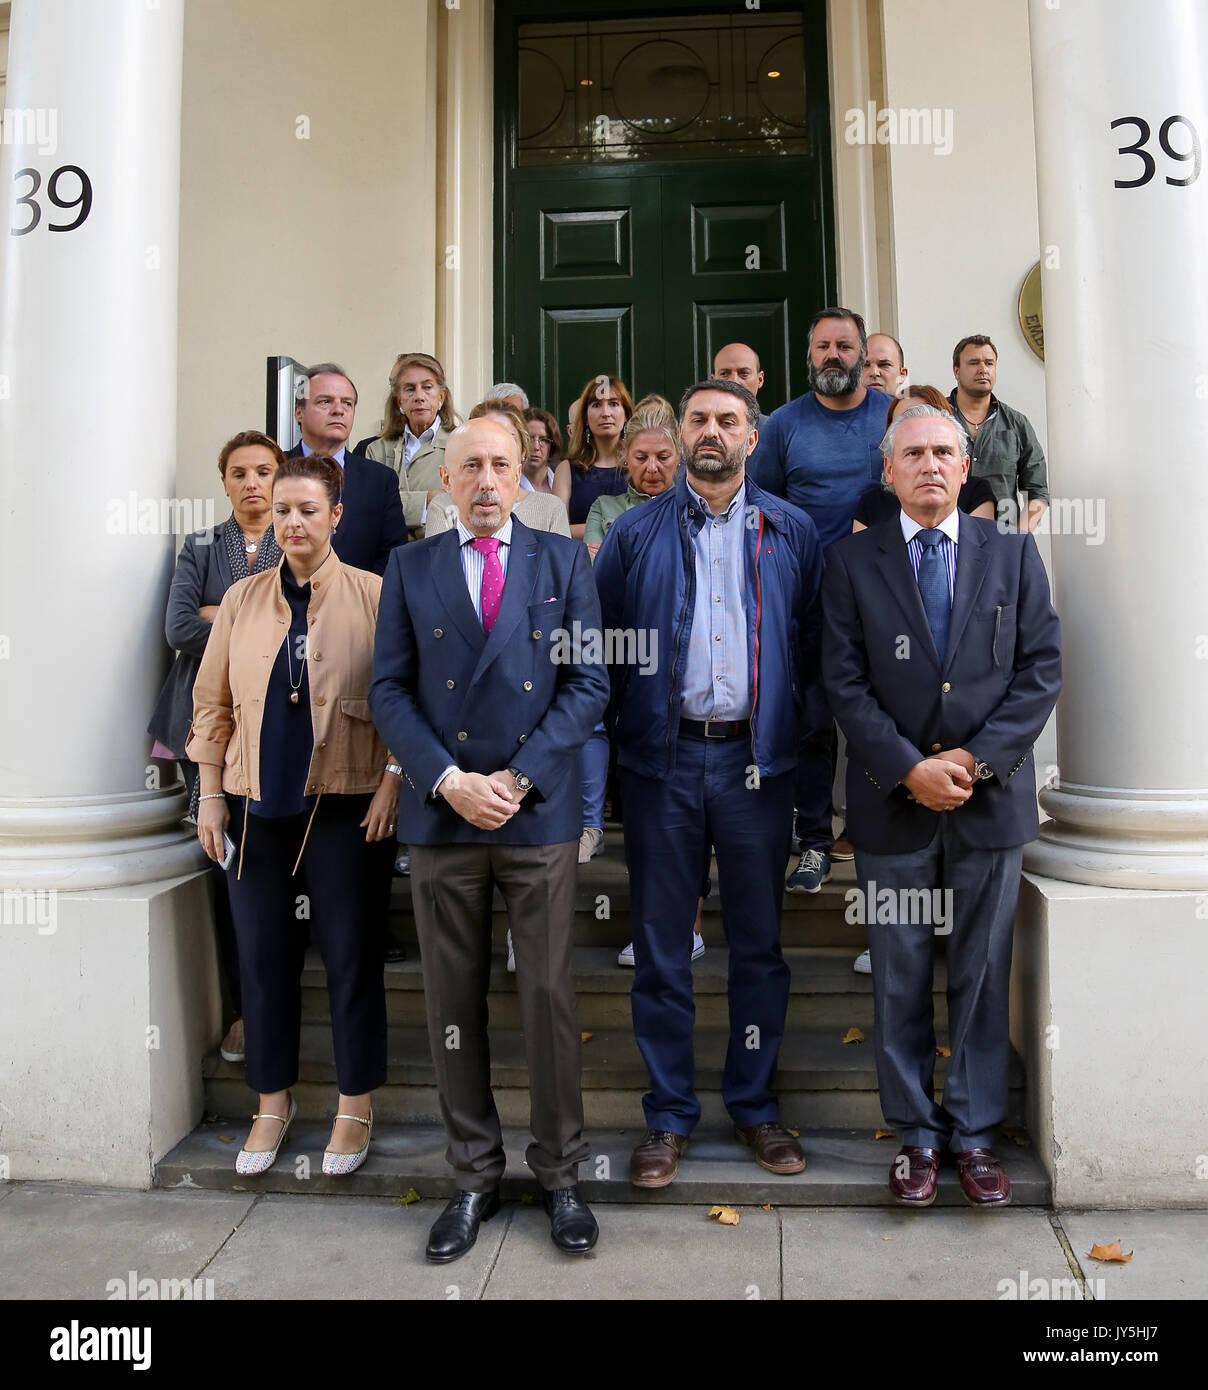 Spanish Embassy. London, UK. 18th Aug, 2017. Staff at the Spanish Embassy in London, including, the Deputy Head Stock Photo